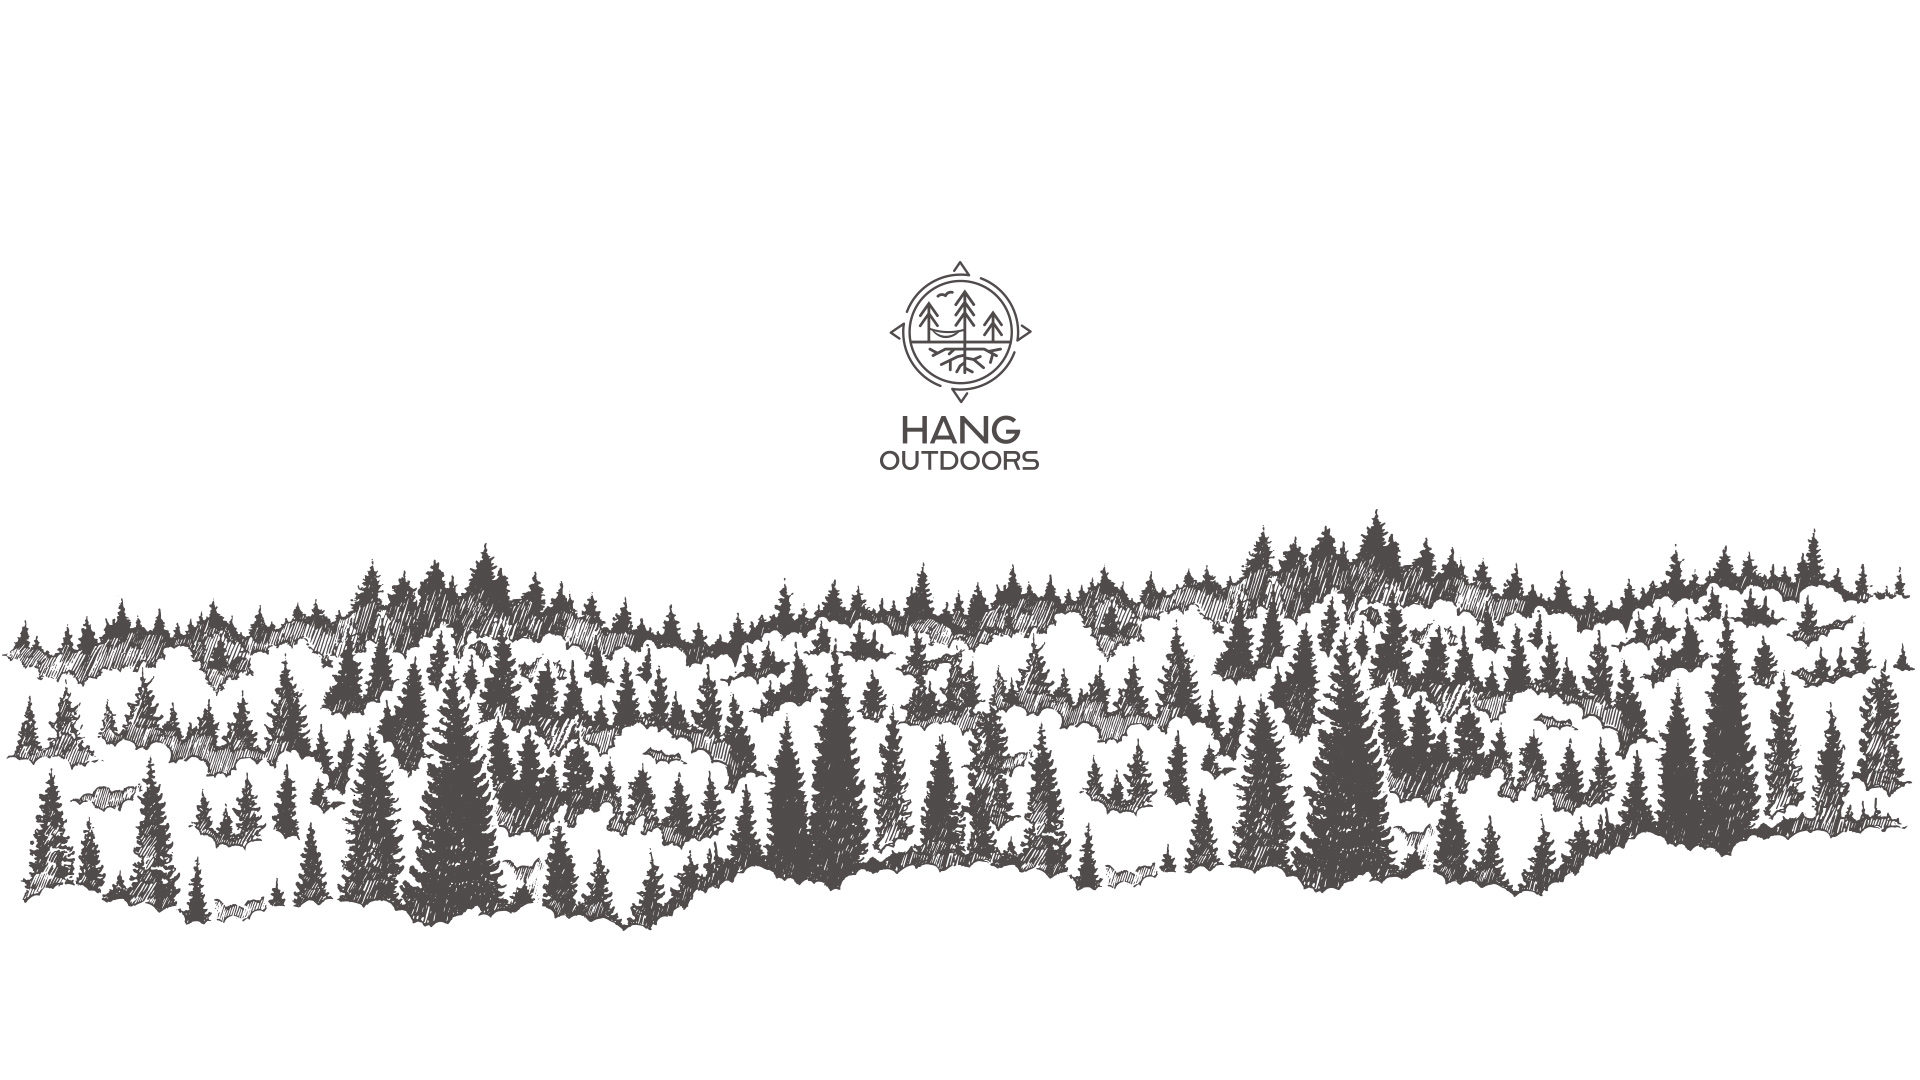 HANG OUTDOORS